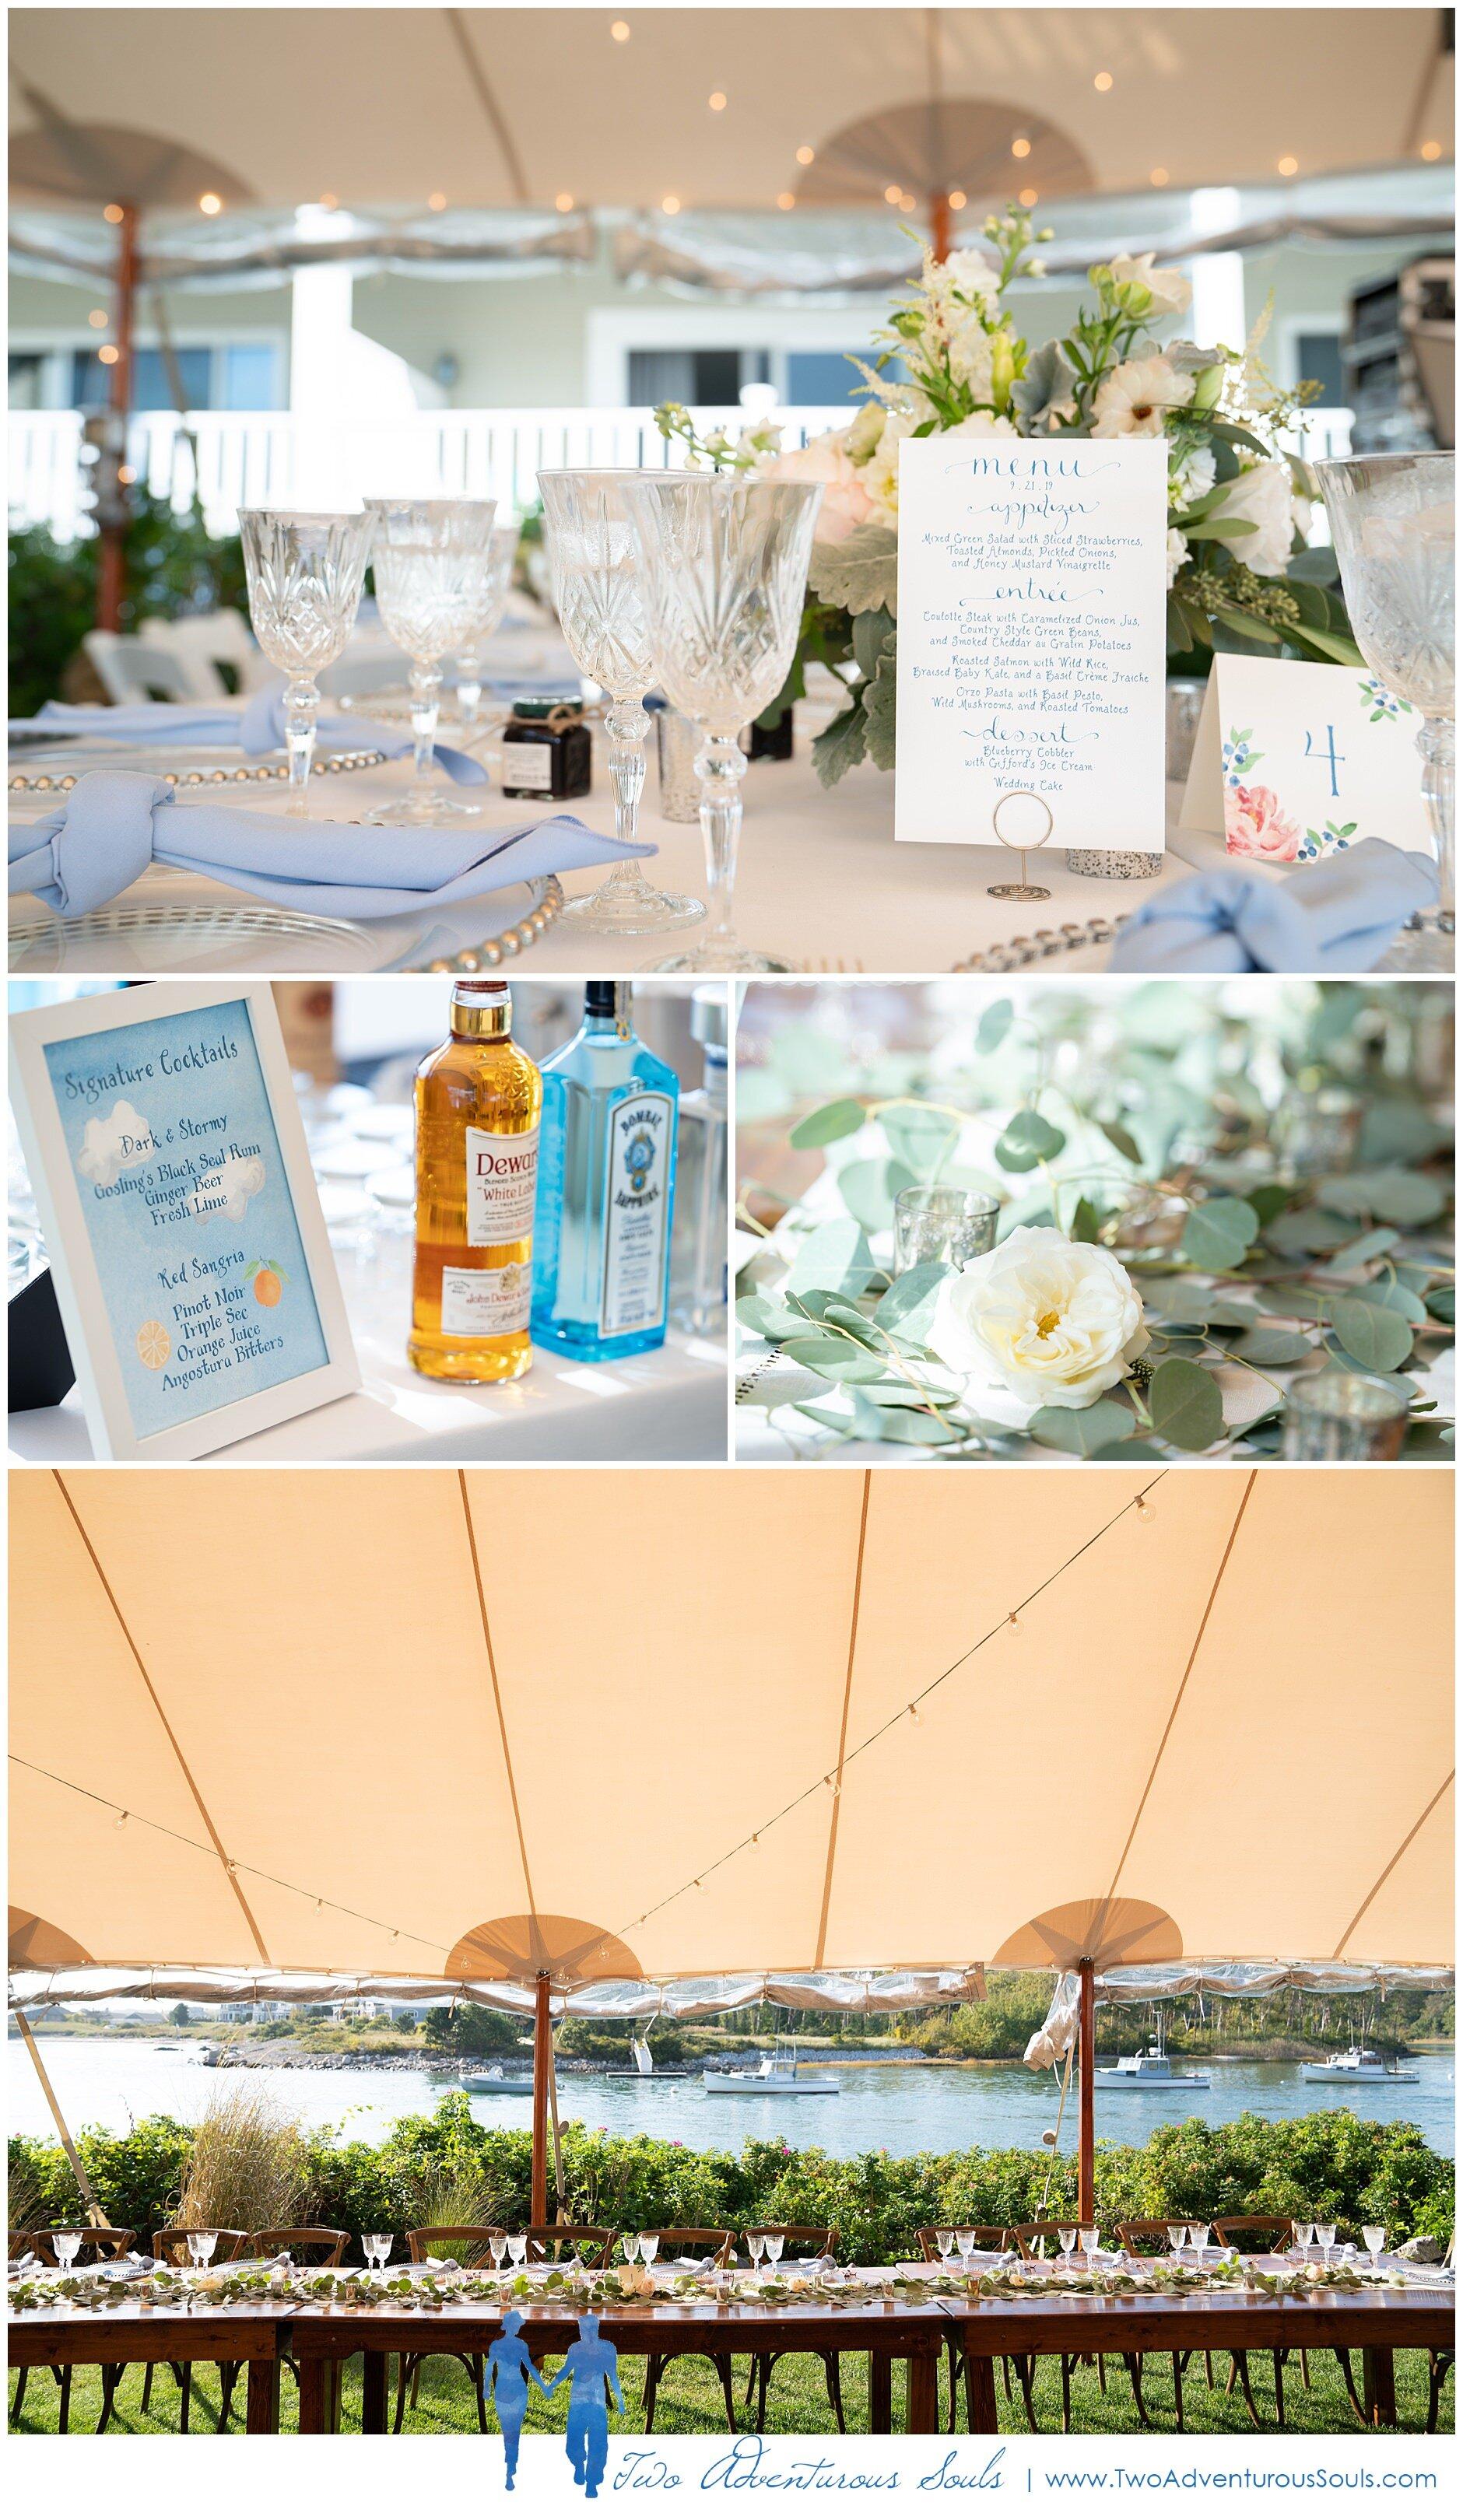 Breakwater Inn and Spa Wedding Photographers, Kennebunkport Wedding Photographers, Two Adventurous Souls- 092119_0037.jpg